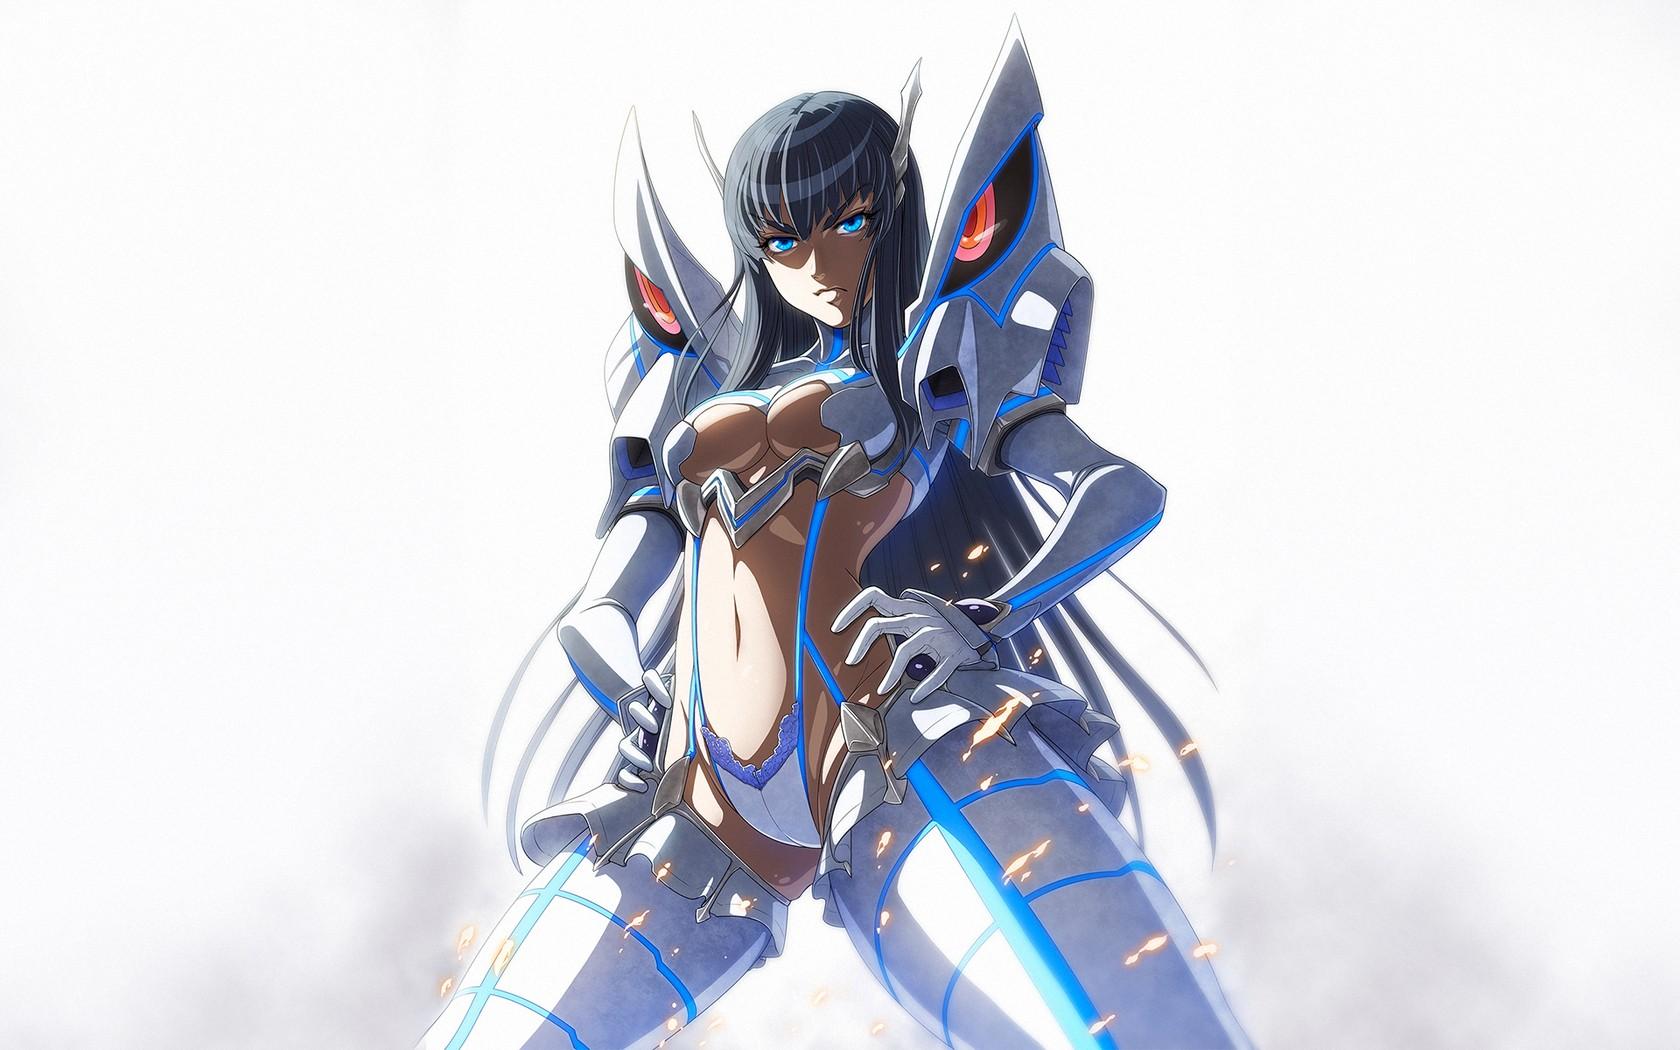 Wallpaper Anime Girls Blue Kill La Kill Kiryuin Satsuki